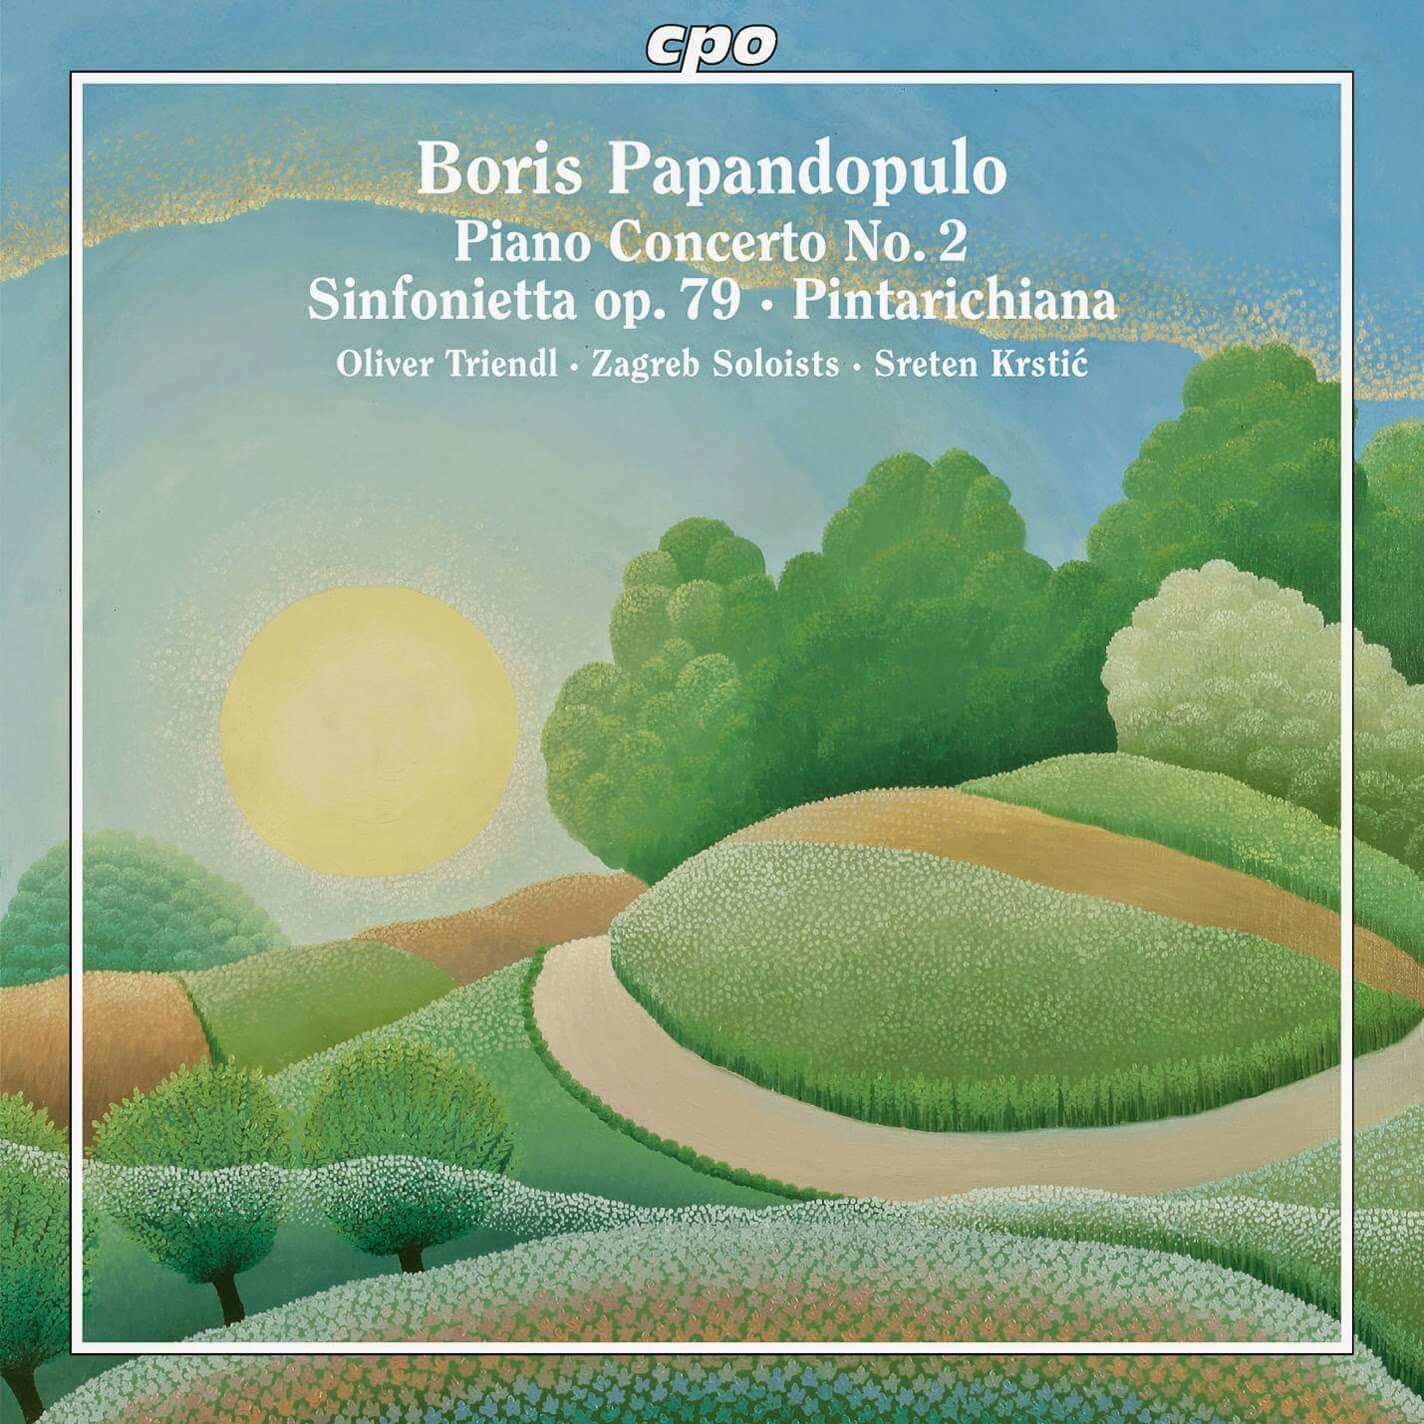 Zagrebacki solisti recent-discography Boris Papandopulo